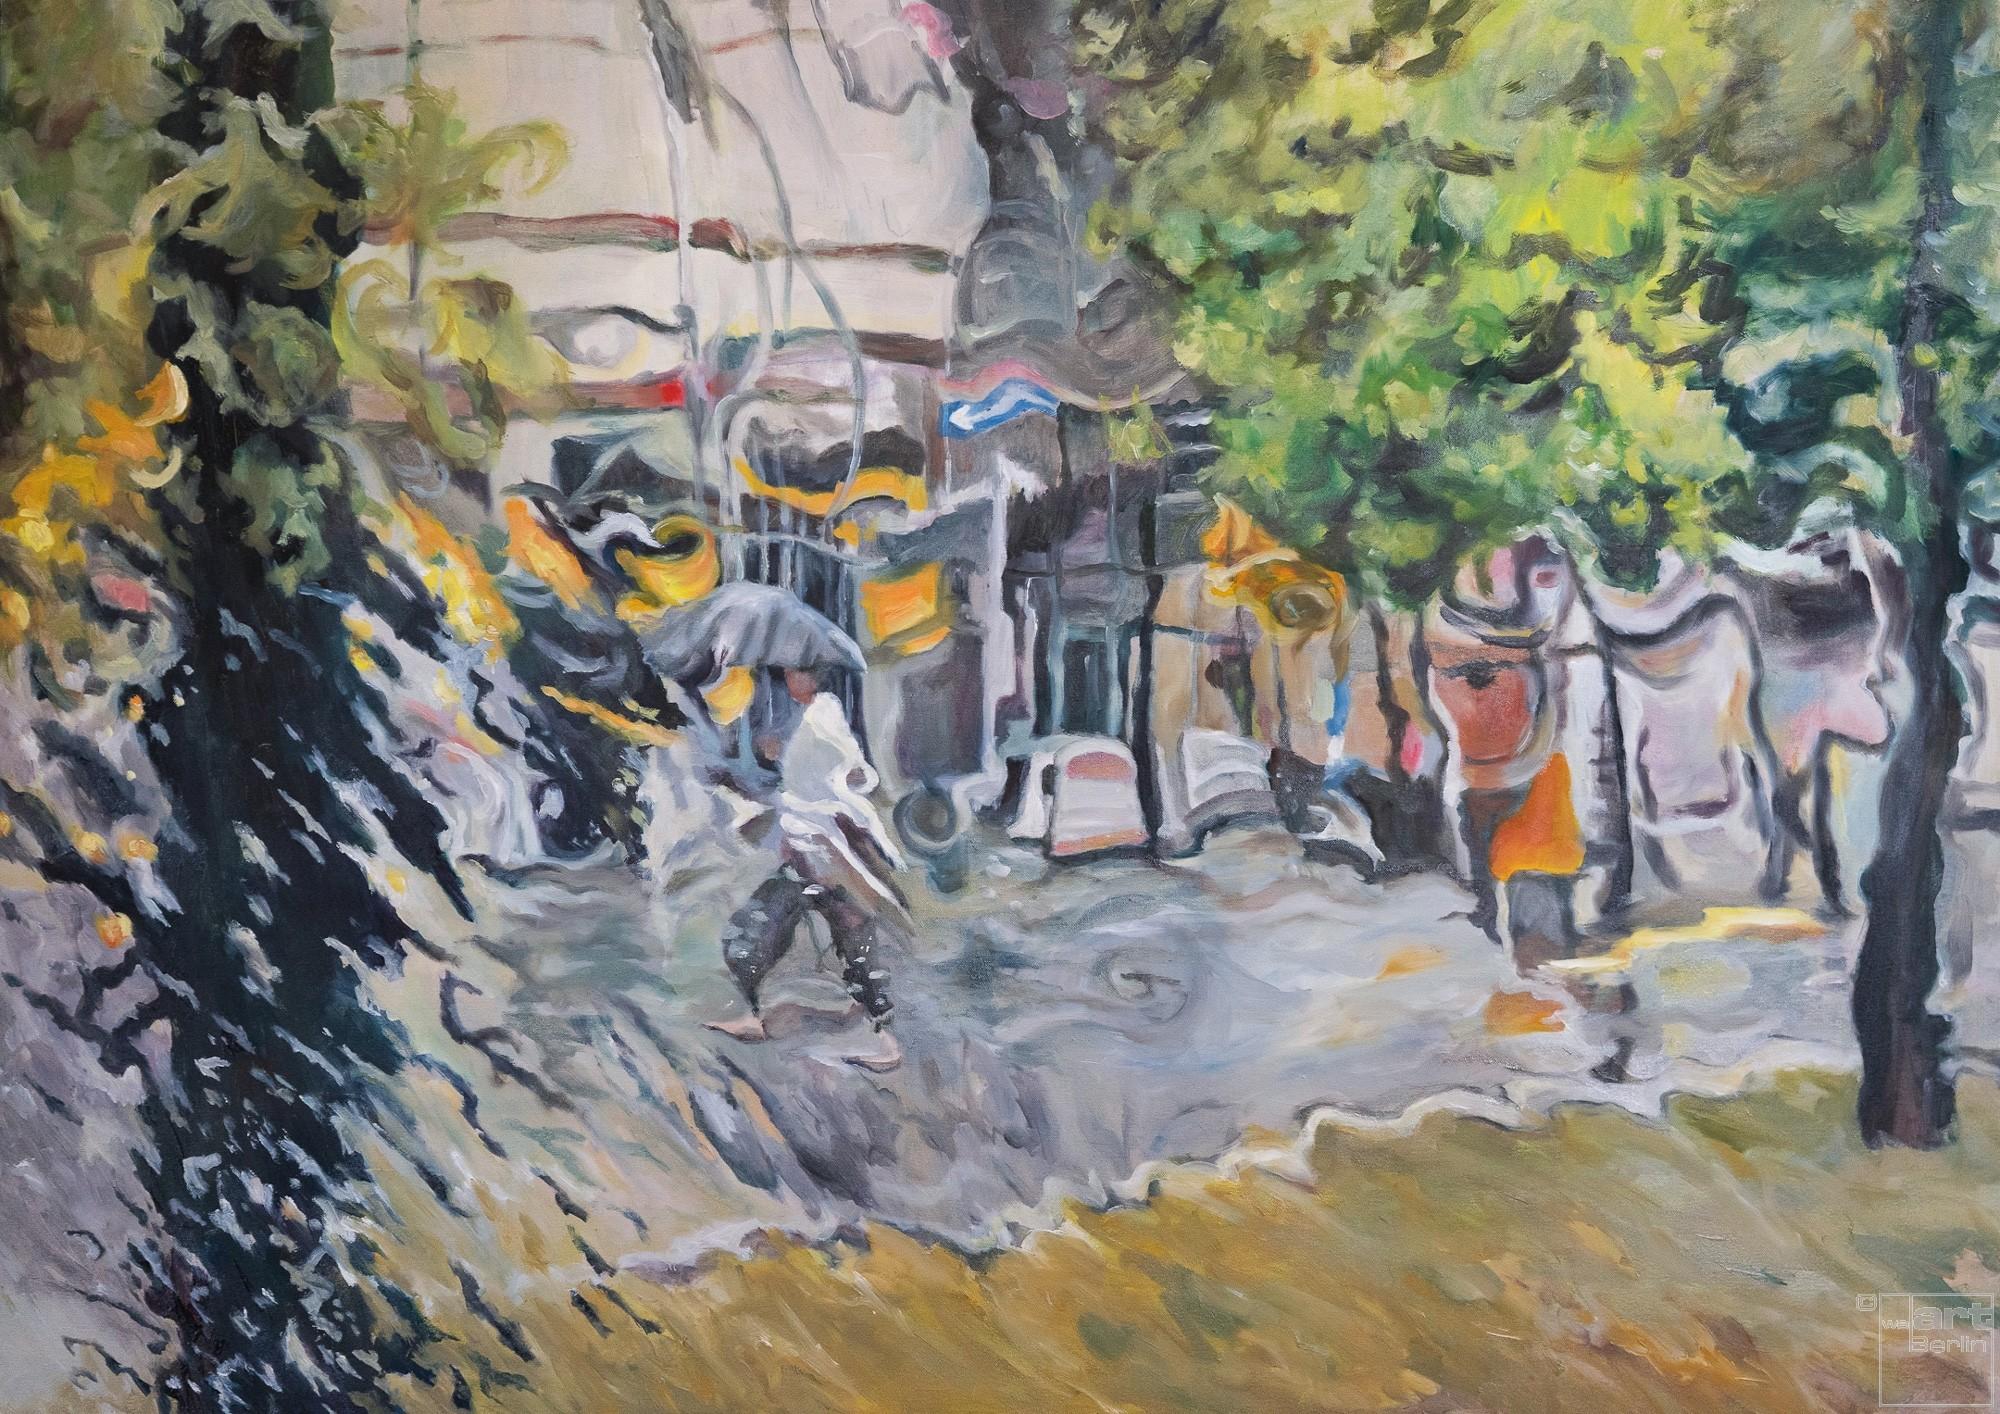 Rainfall I  | Malerei von Künstlerin Simone Westphal, Öl auf Leinwand